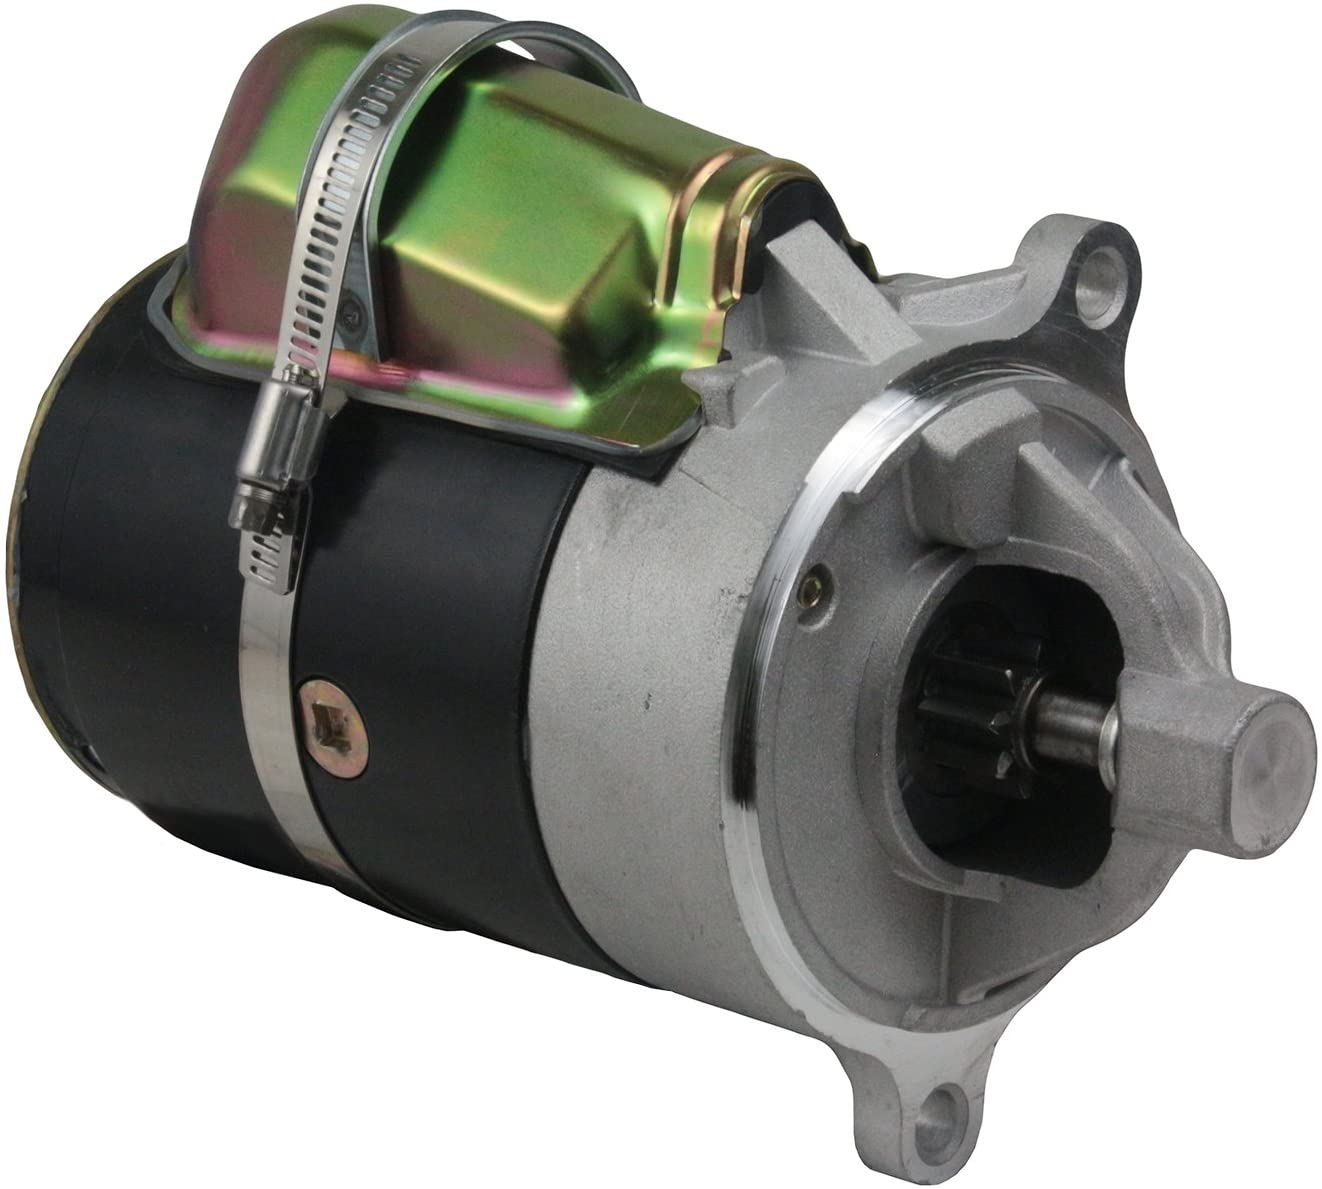 Rareelectrical NEW CCW STARTER COMPATIBLE WITH PLEASURECRAFT MARINE ENGINE 302CI 351CI 460CI D8FF-11001-EA